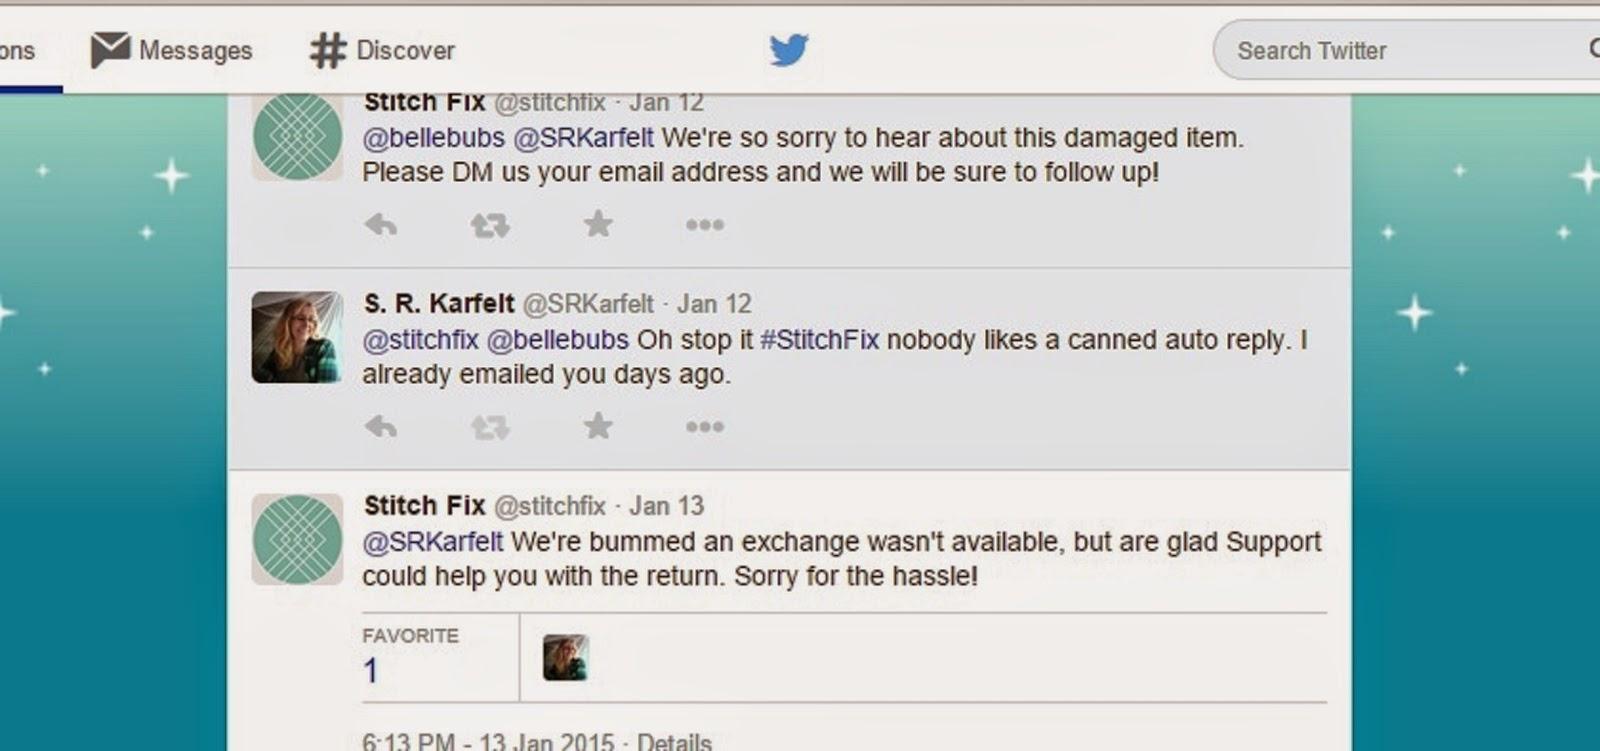 Stitch Fix, Customer Service, S. R. Karfelt